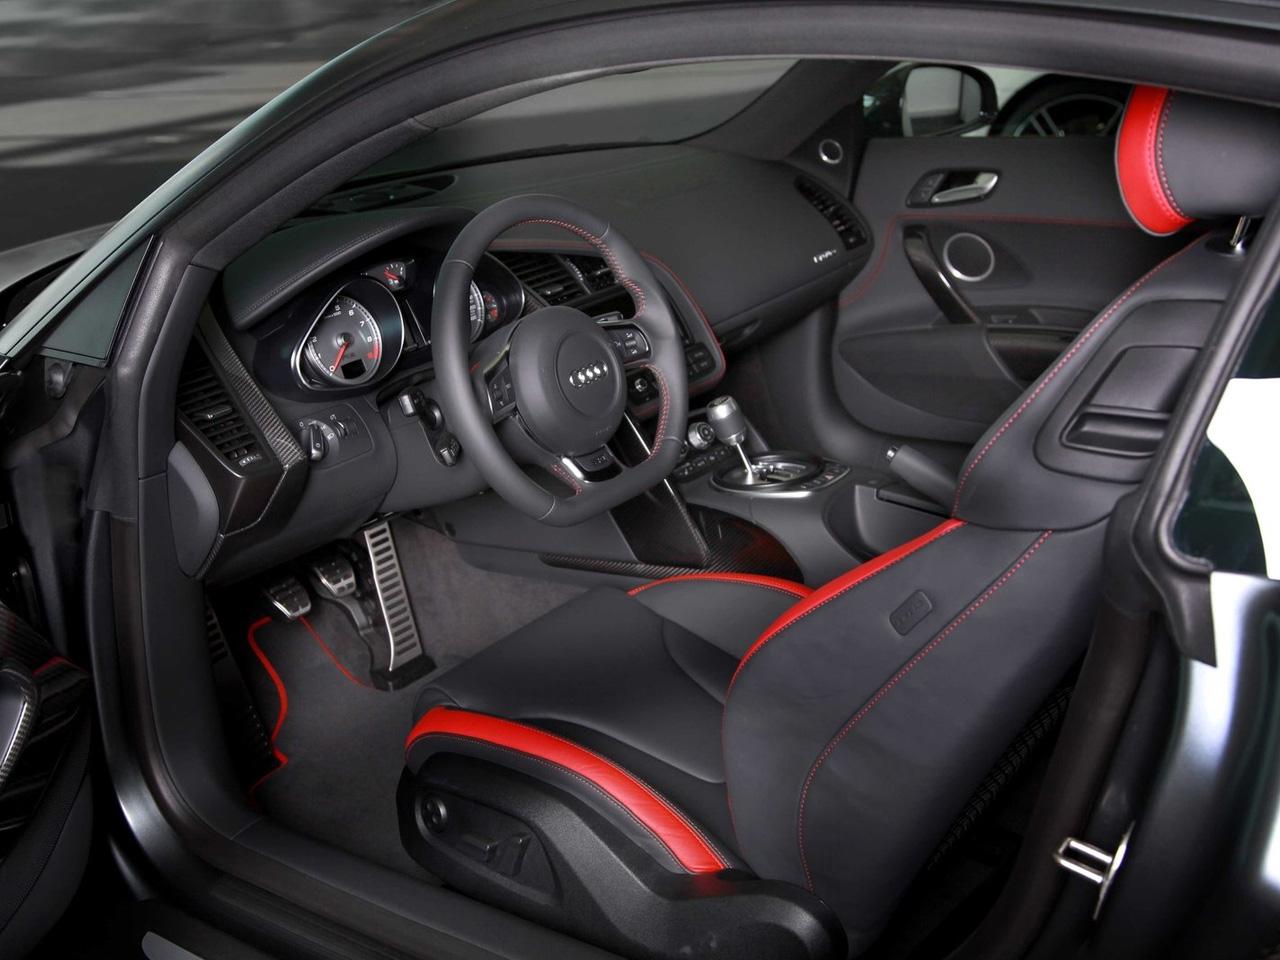 2015 Audi R8 Interior Wallpaper Collection 1280x960